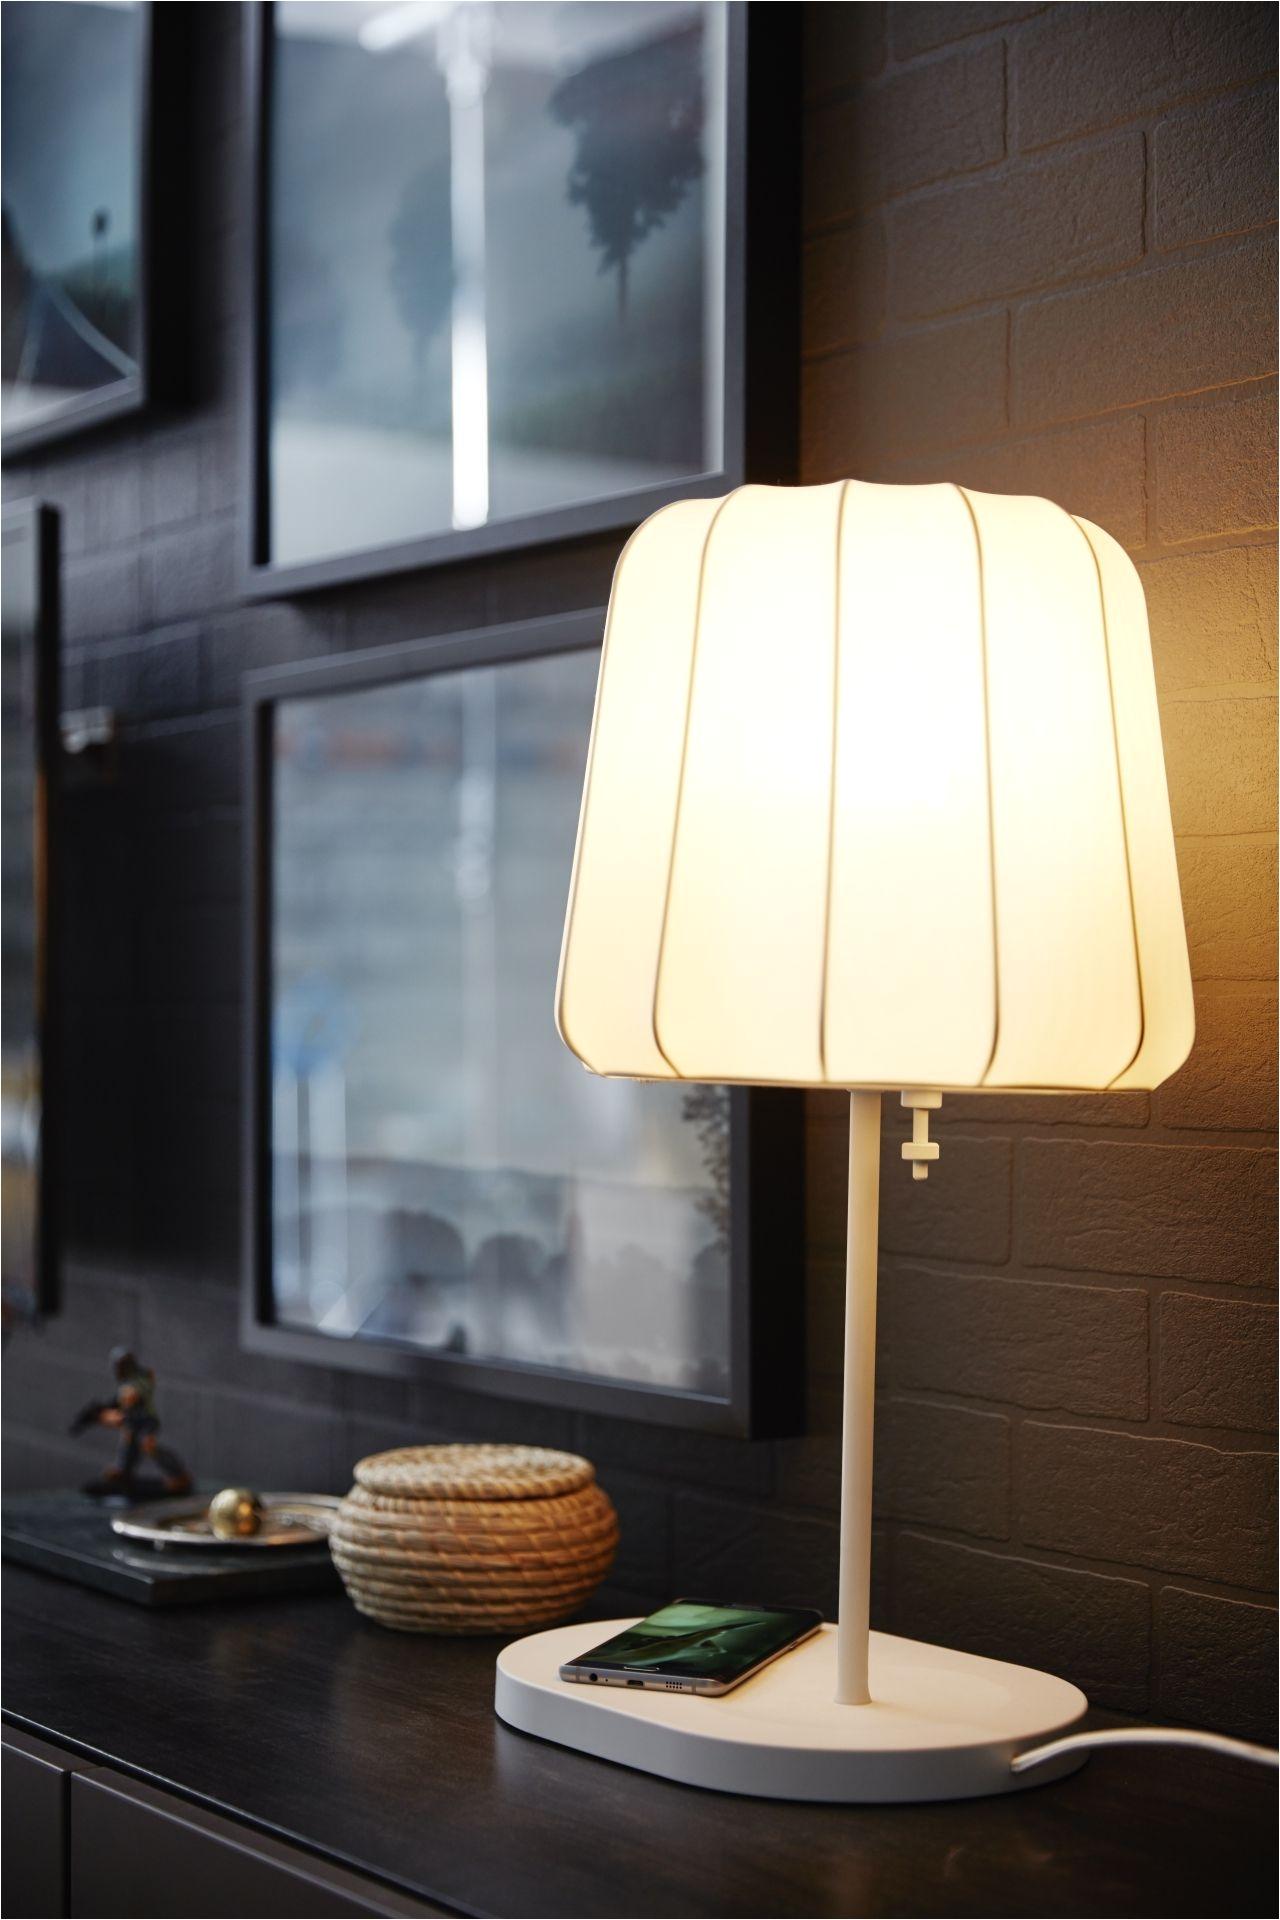 varv tafellamp met draadloos opladen